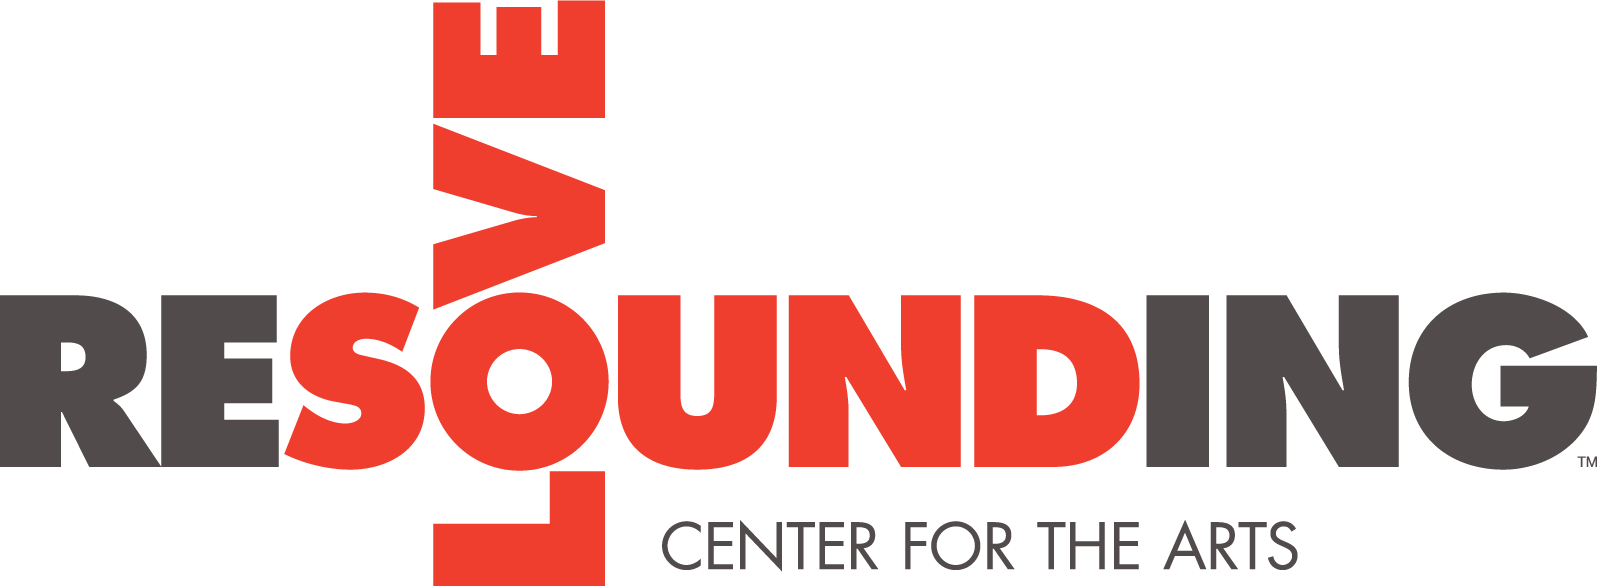 Resounding Love logo